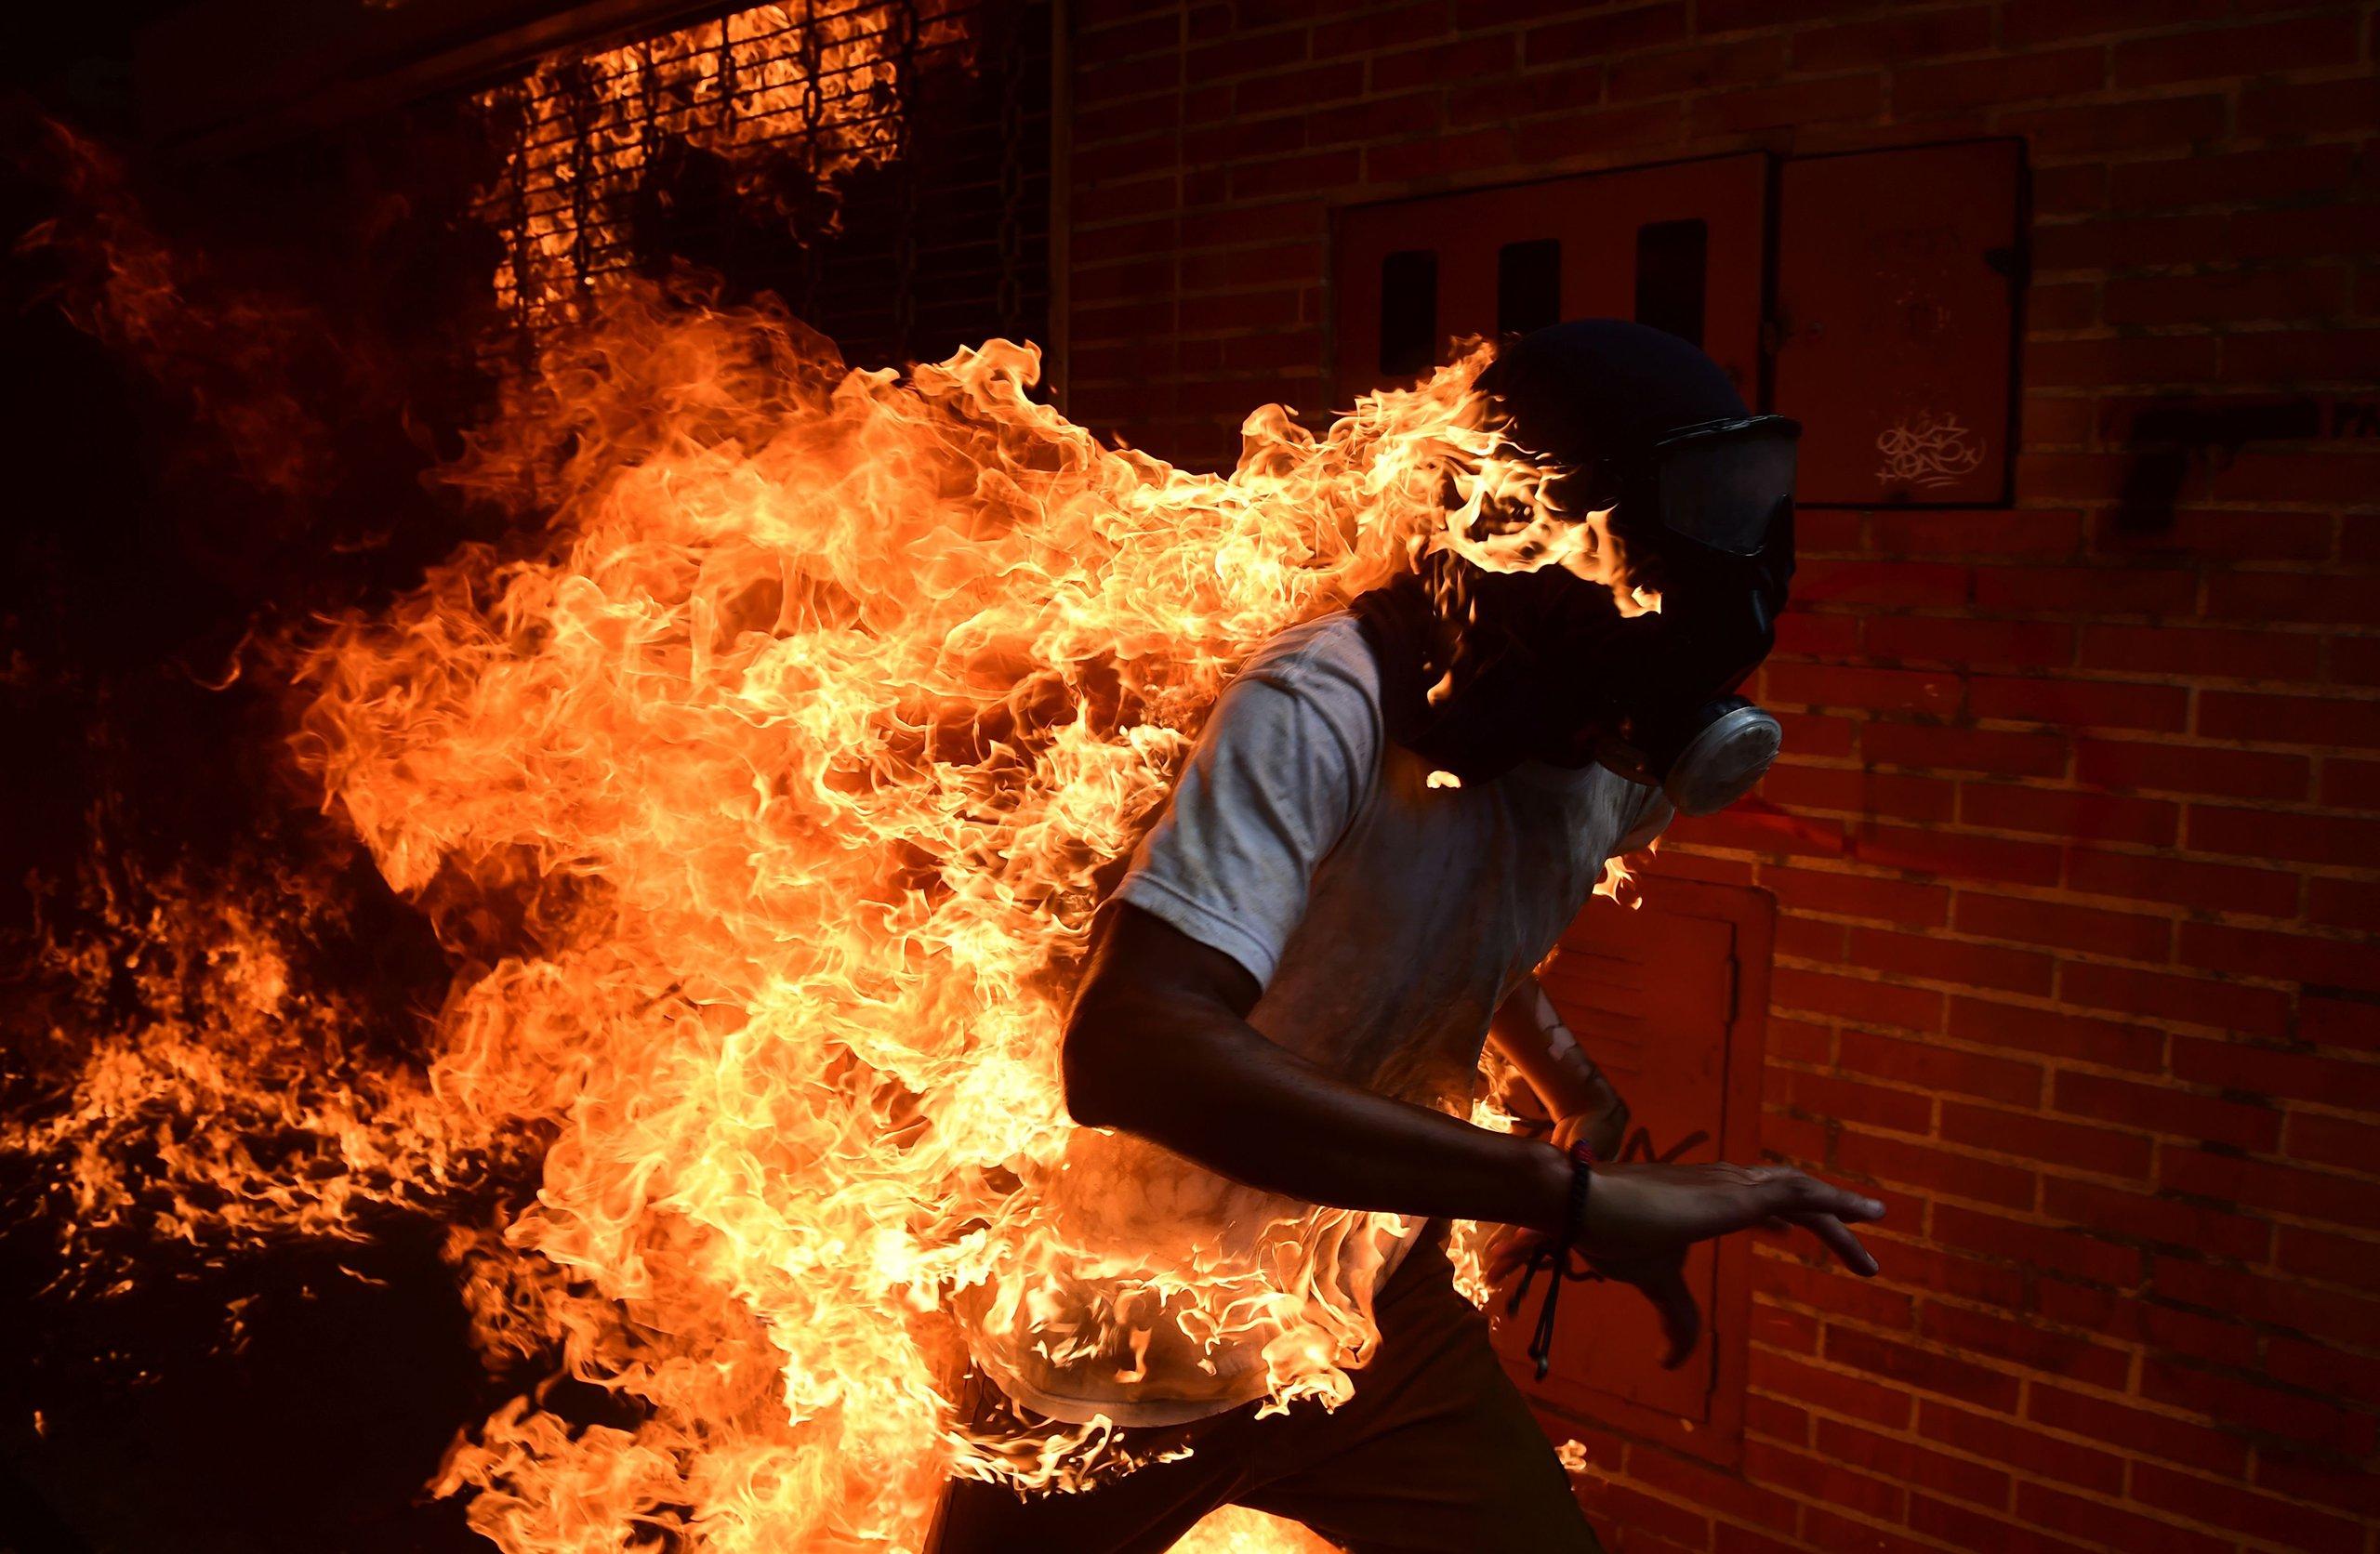 Caracas: Harrowing Photos of Protester on Fire in Venezuela | Time.com